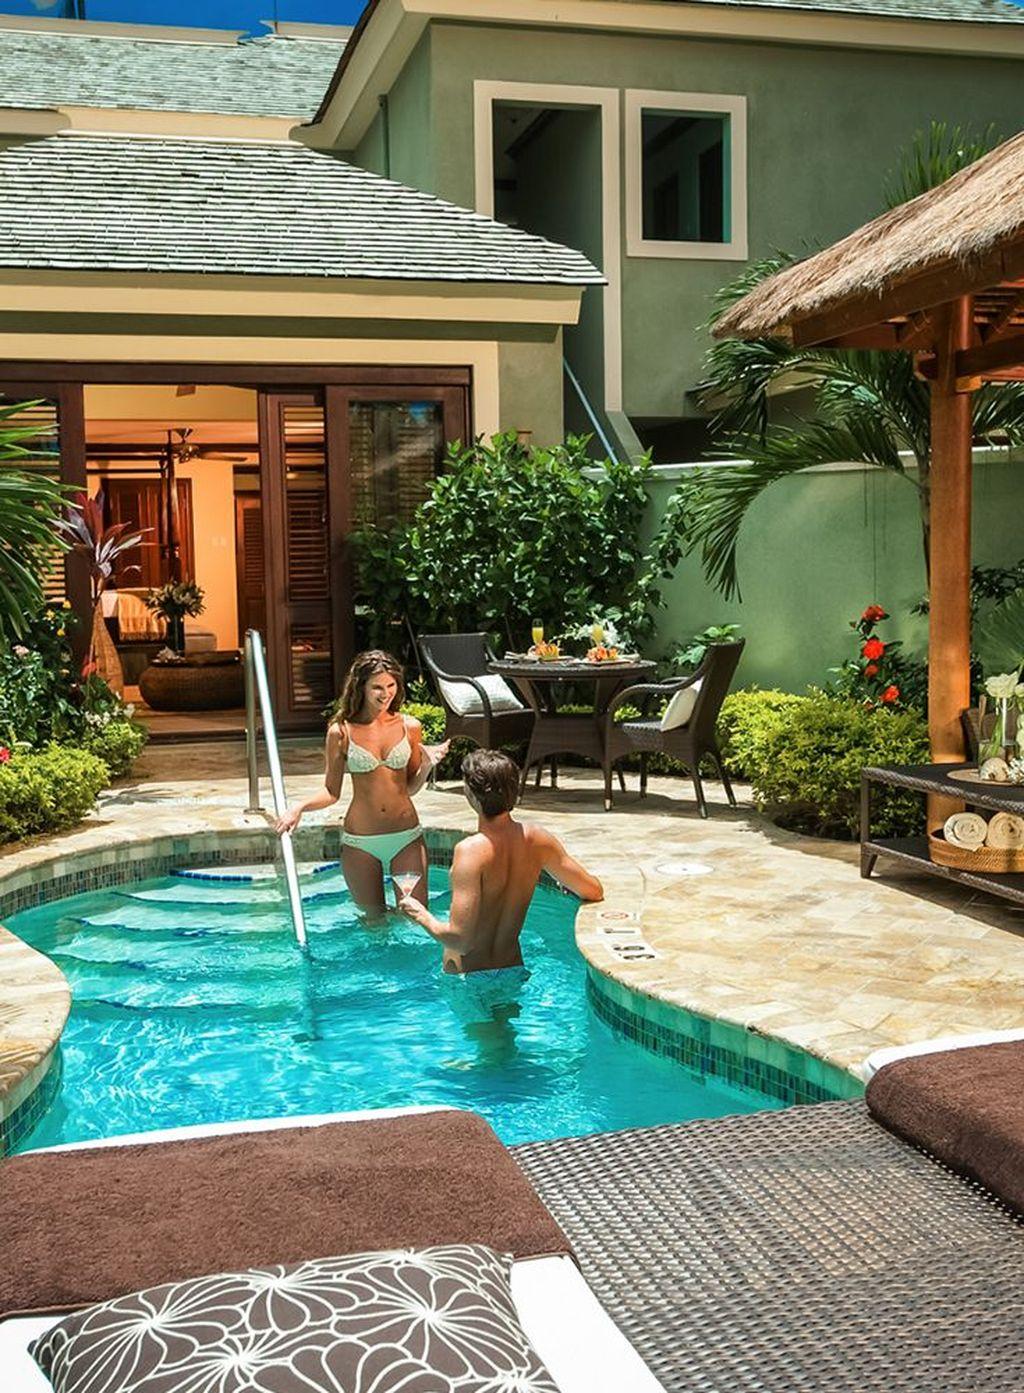 Awesome Backyard Patio Ideas With Beautiful Pool 24